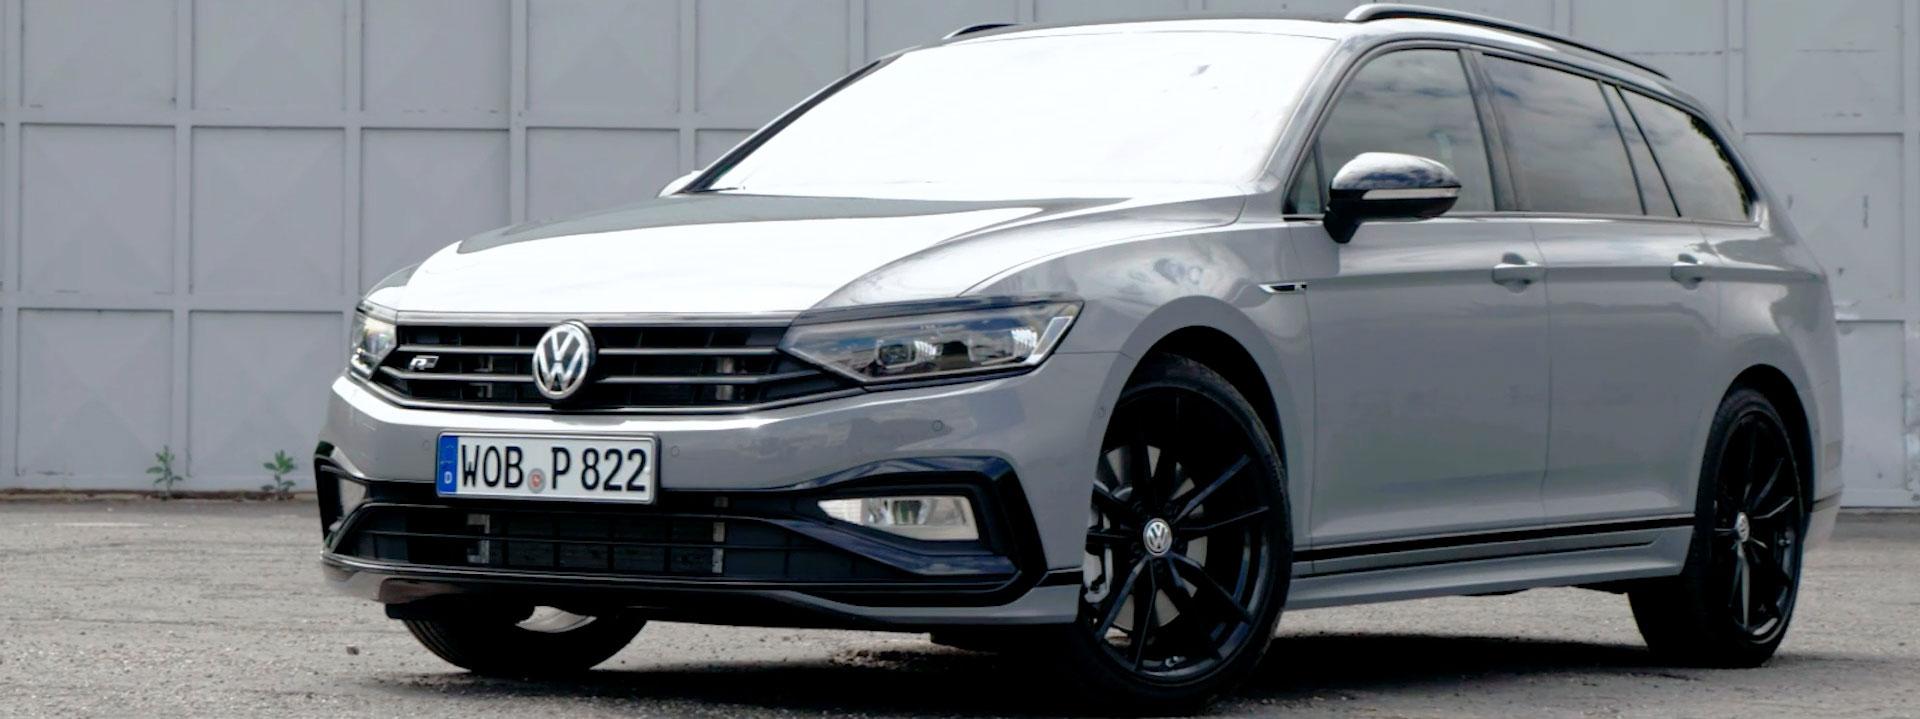 VW jahrsrückblick 2019_02.jpg